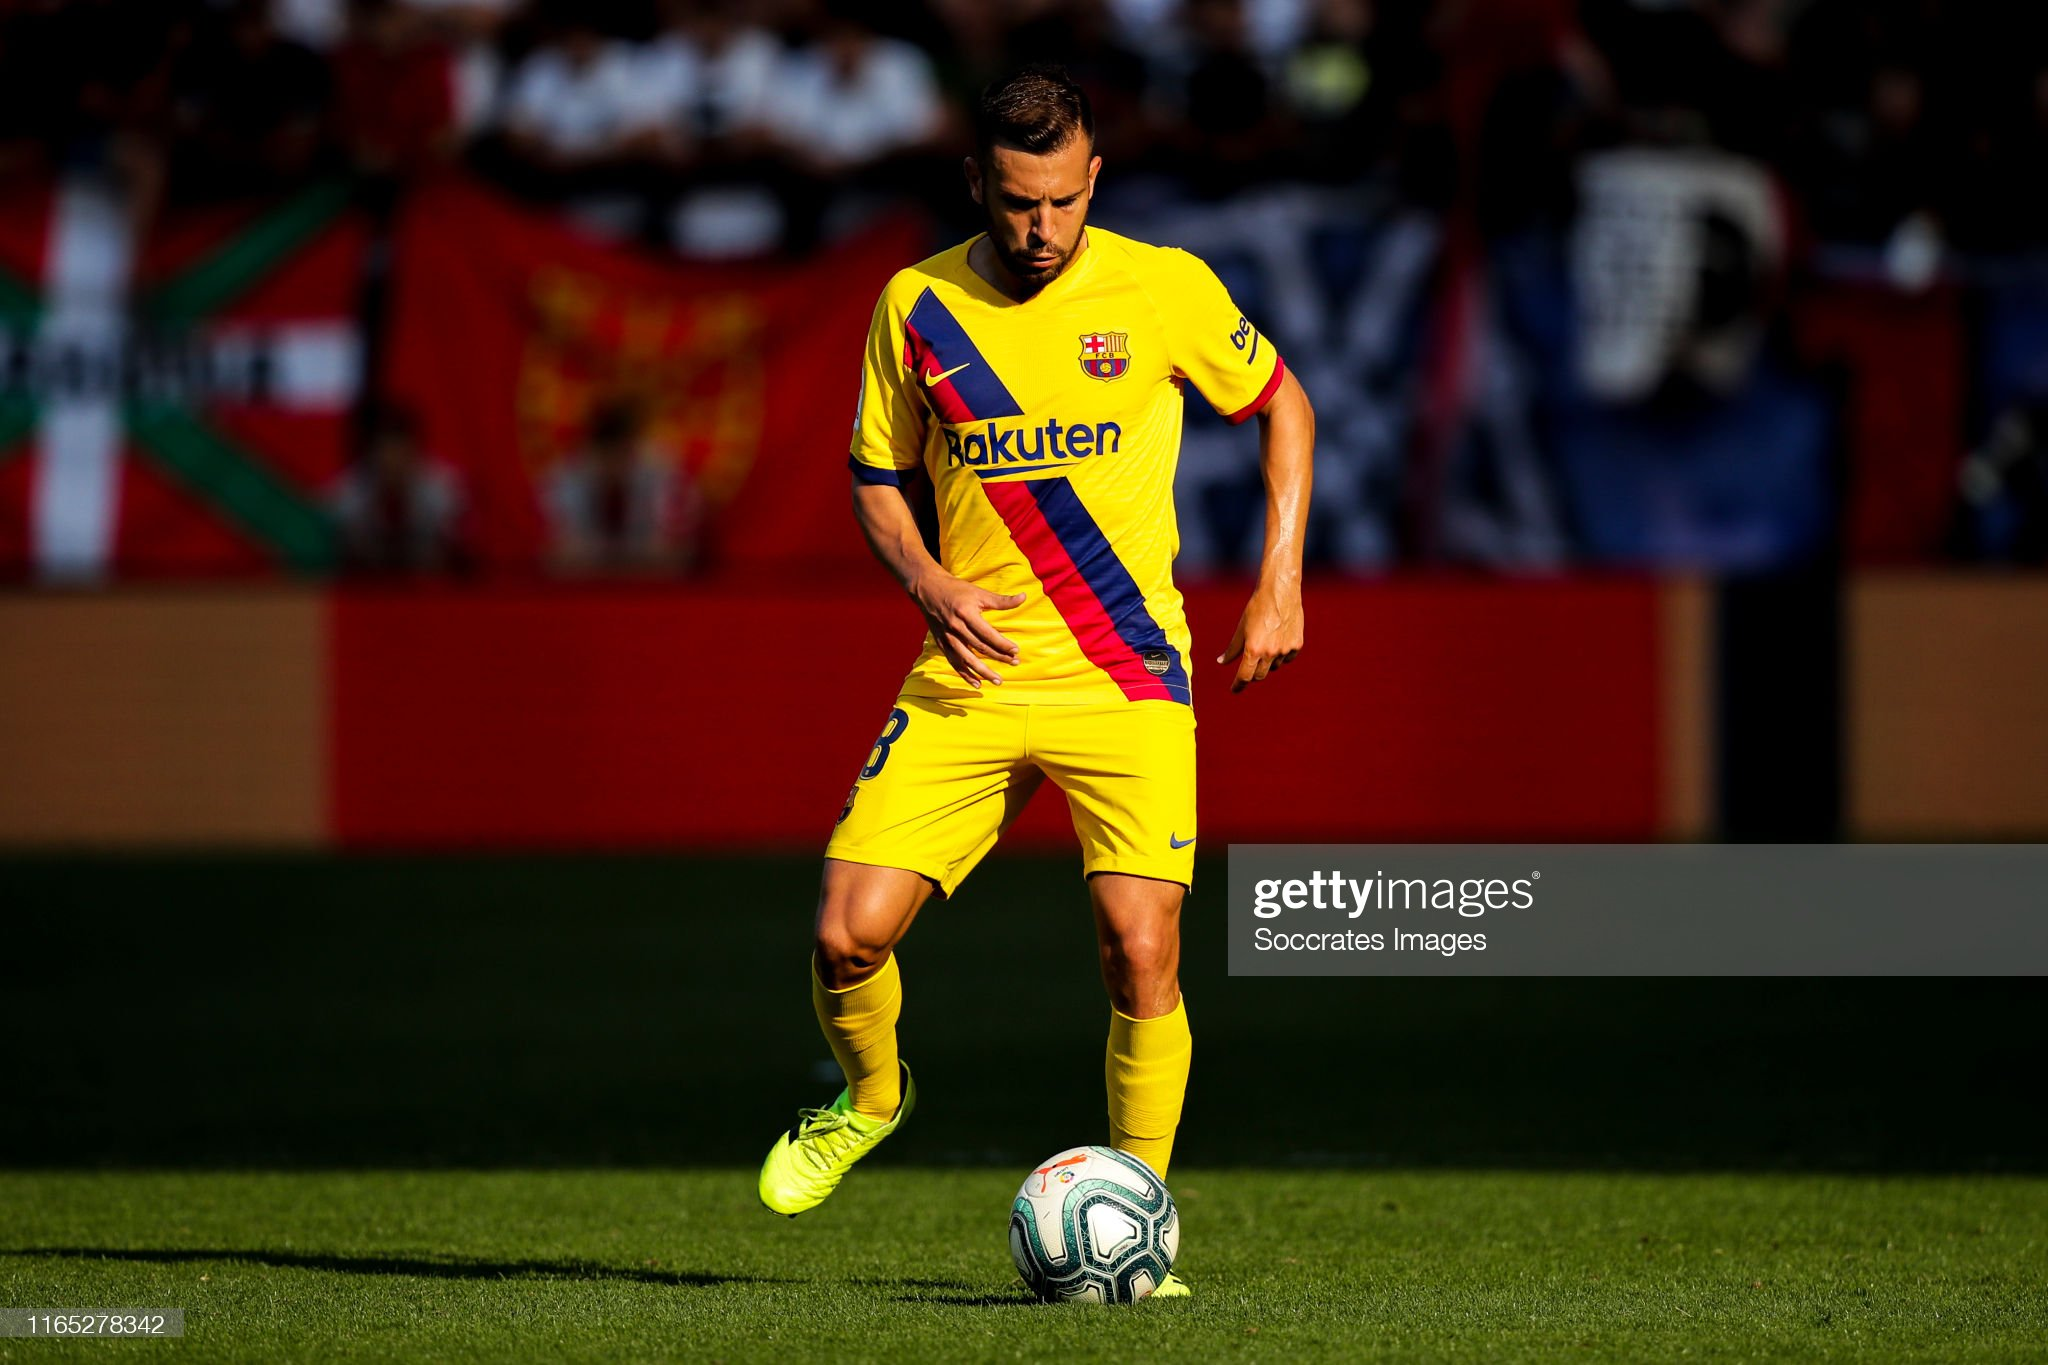 صور مباراة : أوساسونا - برشلونة 2-2 ( 31-08-2019 )  Jordi-alba-of-fc-barcelona-during-the-la-liga-santander-match-between-picture-id1165278342?s=2048x2048